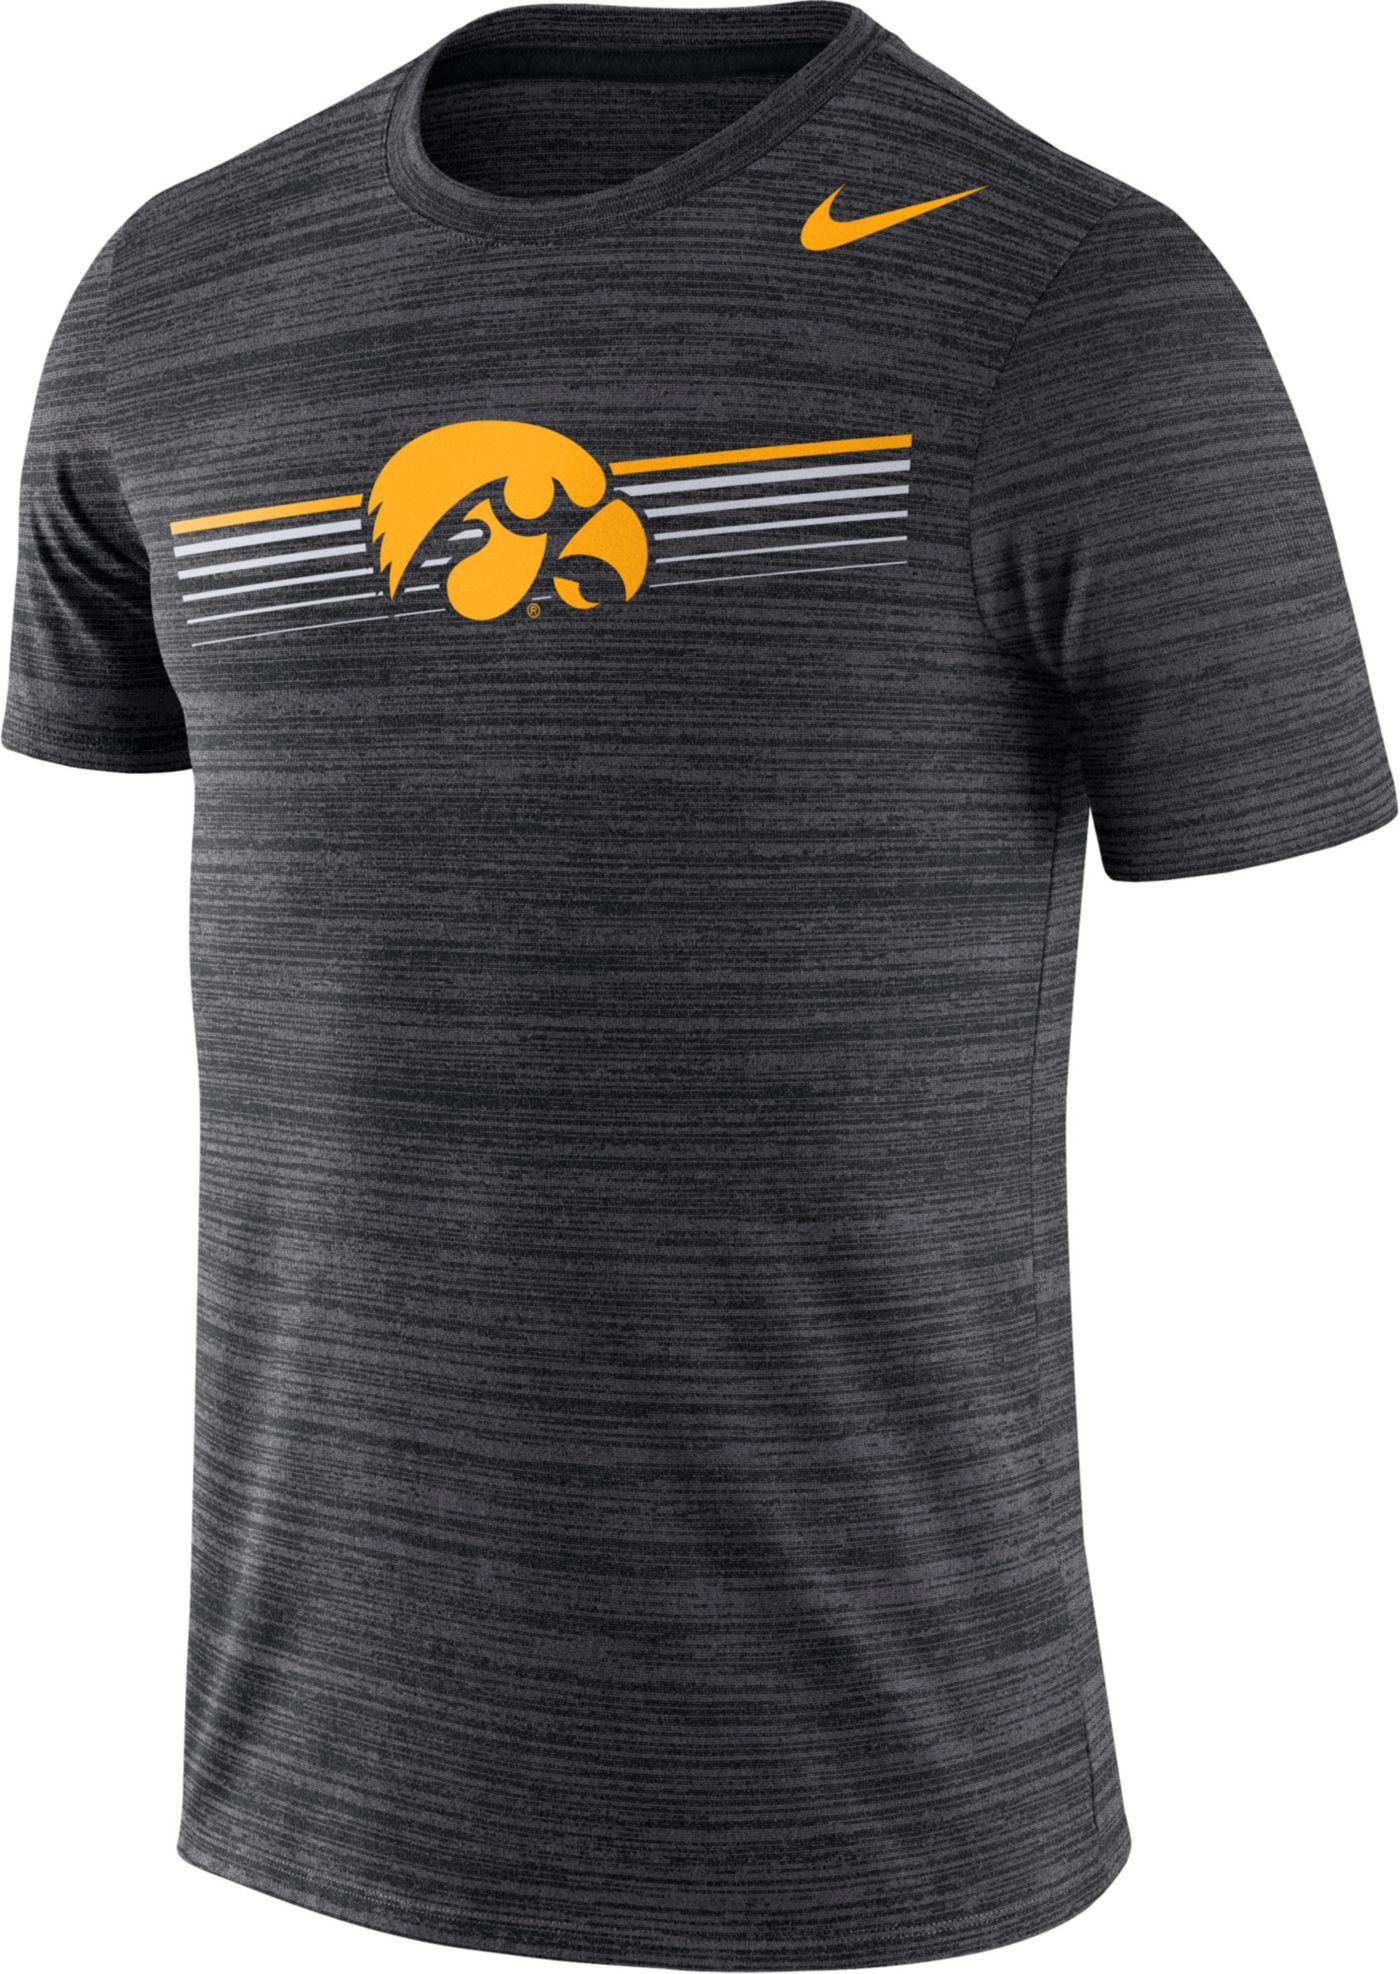 Nike Men's Iowa Hawkeyes Velocity Legend Graphic Black T-Shirt